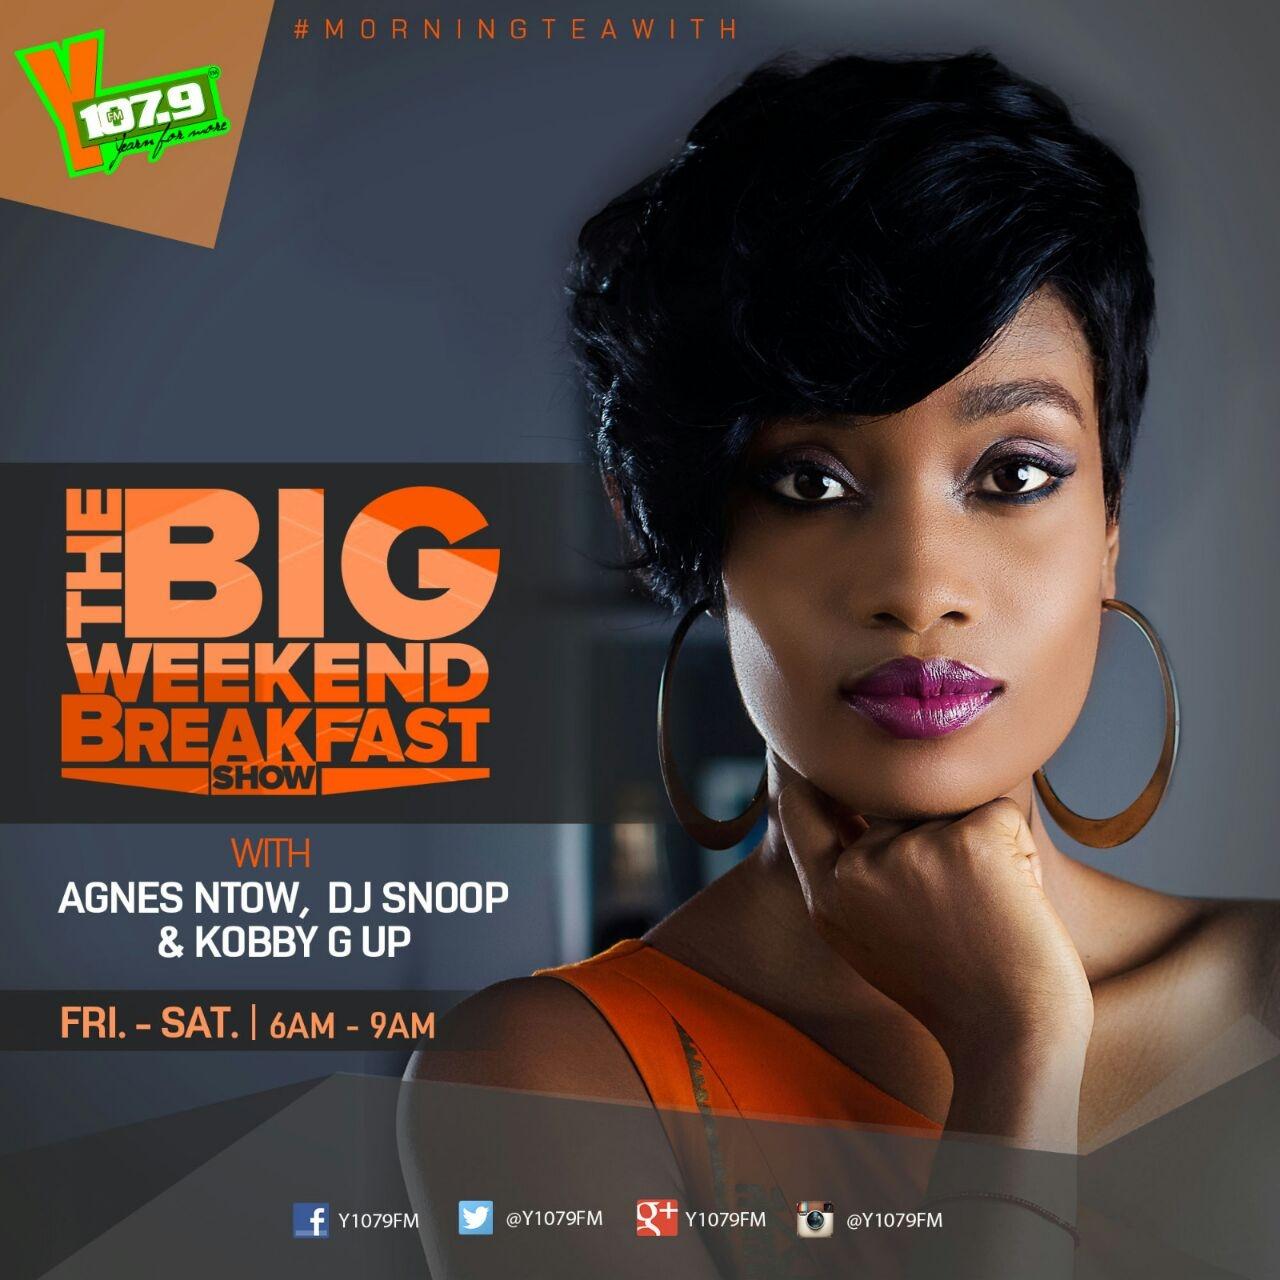 The Big Weekend Breakfast Show